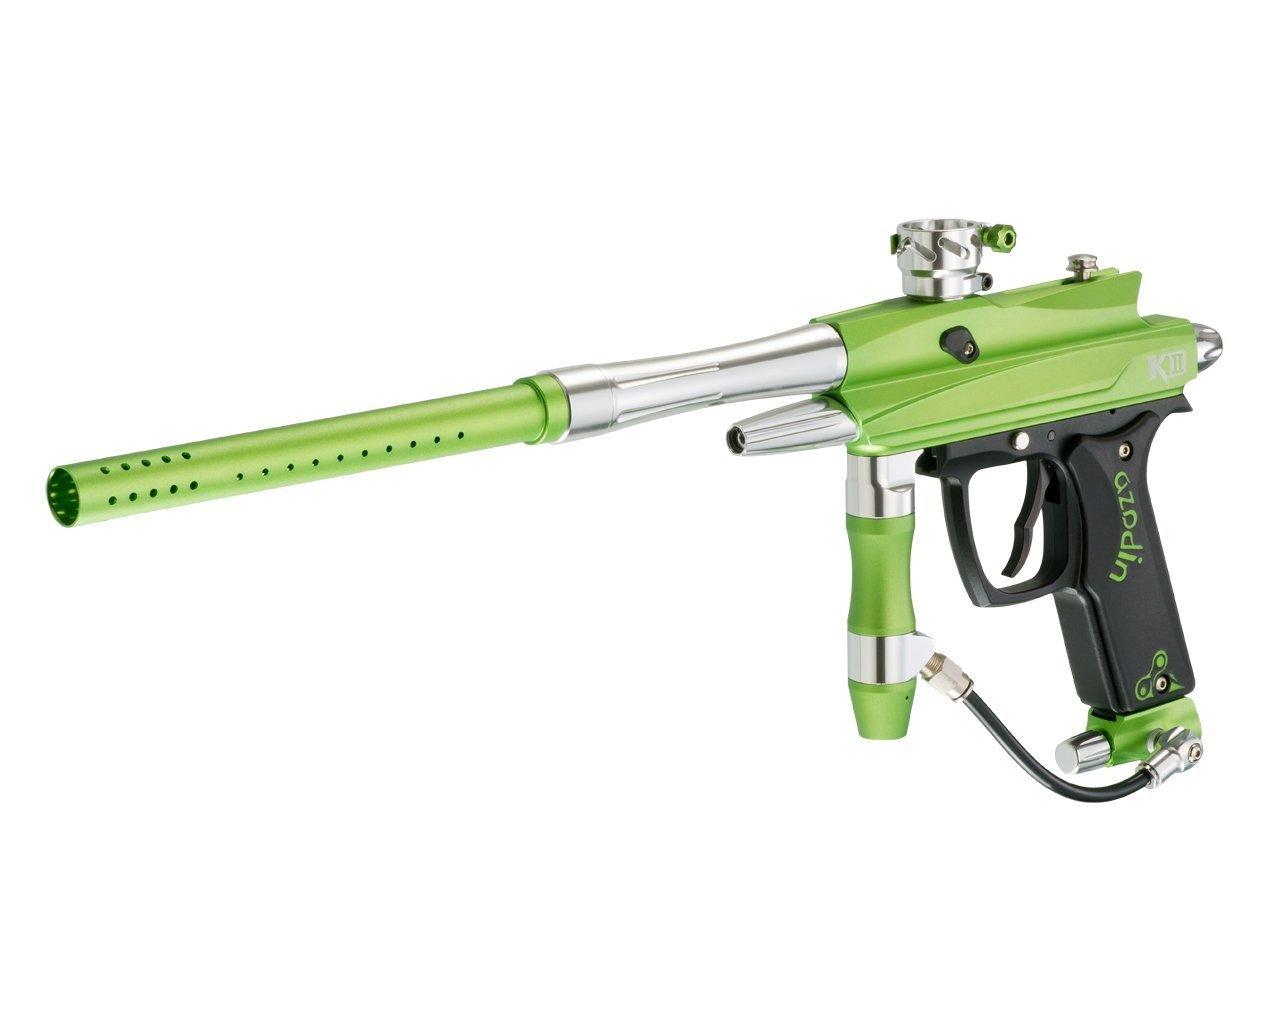 Amazoncom Azodin KD II Paintball Gun Emerald Sports Outdoors 1280x1024